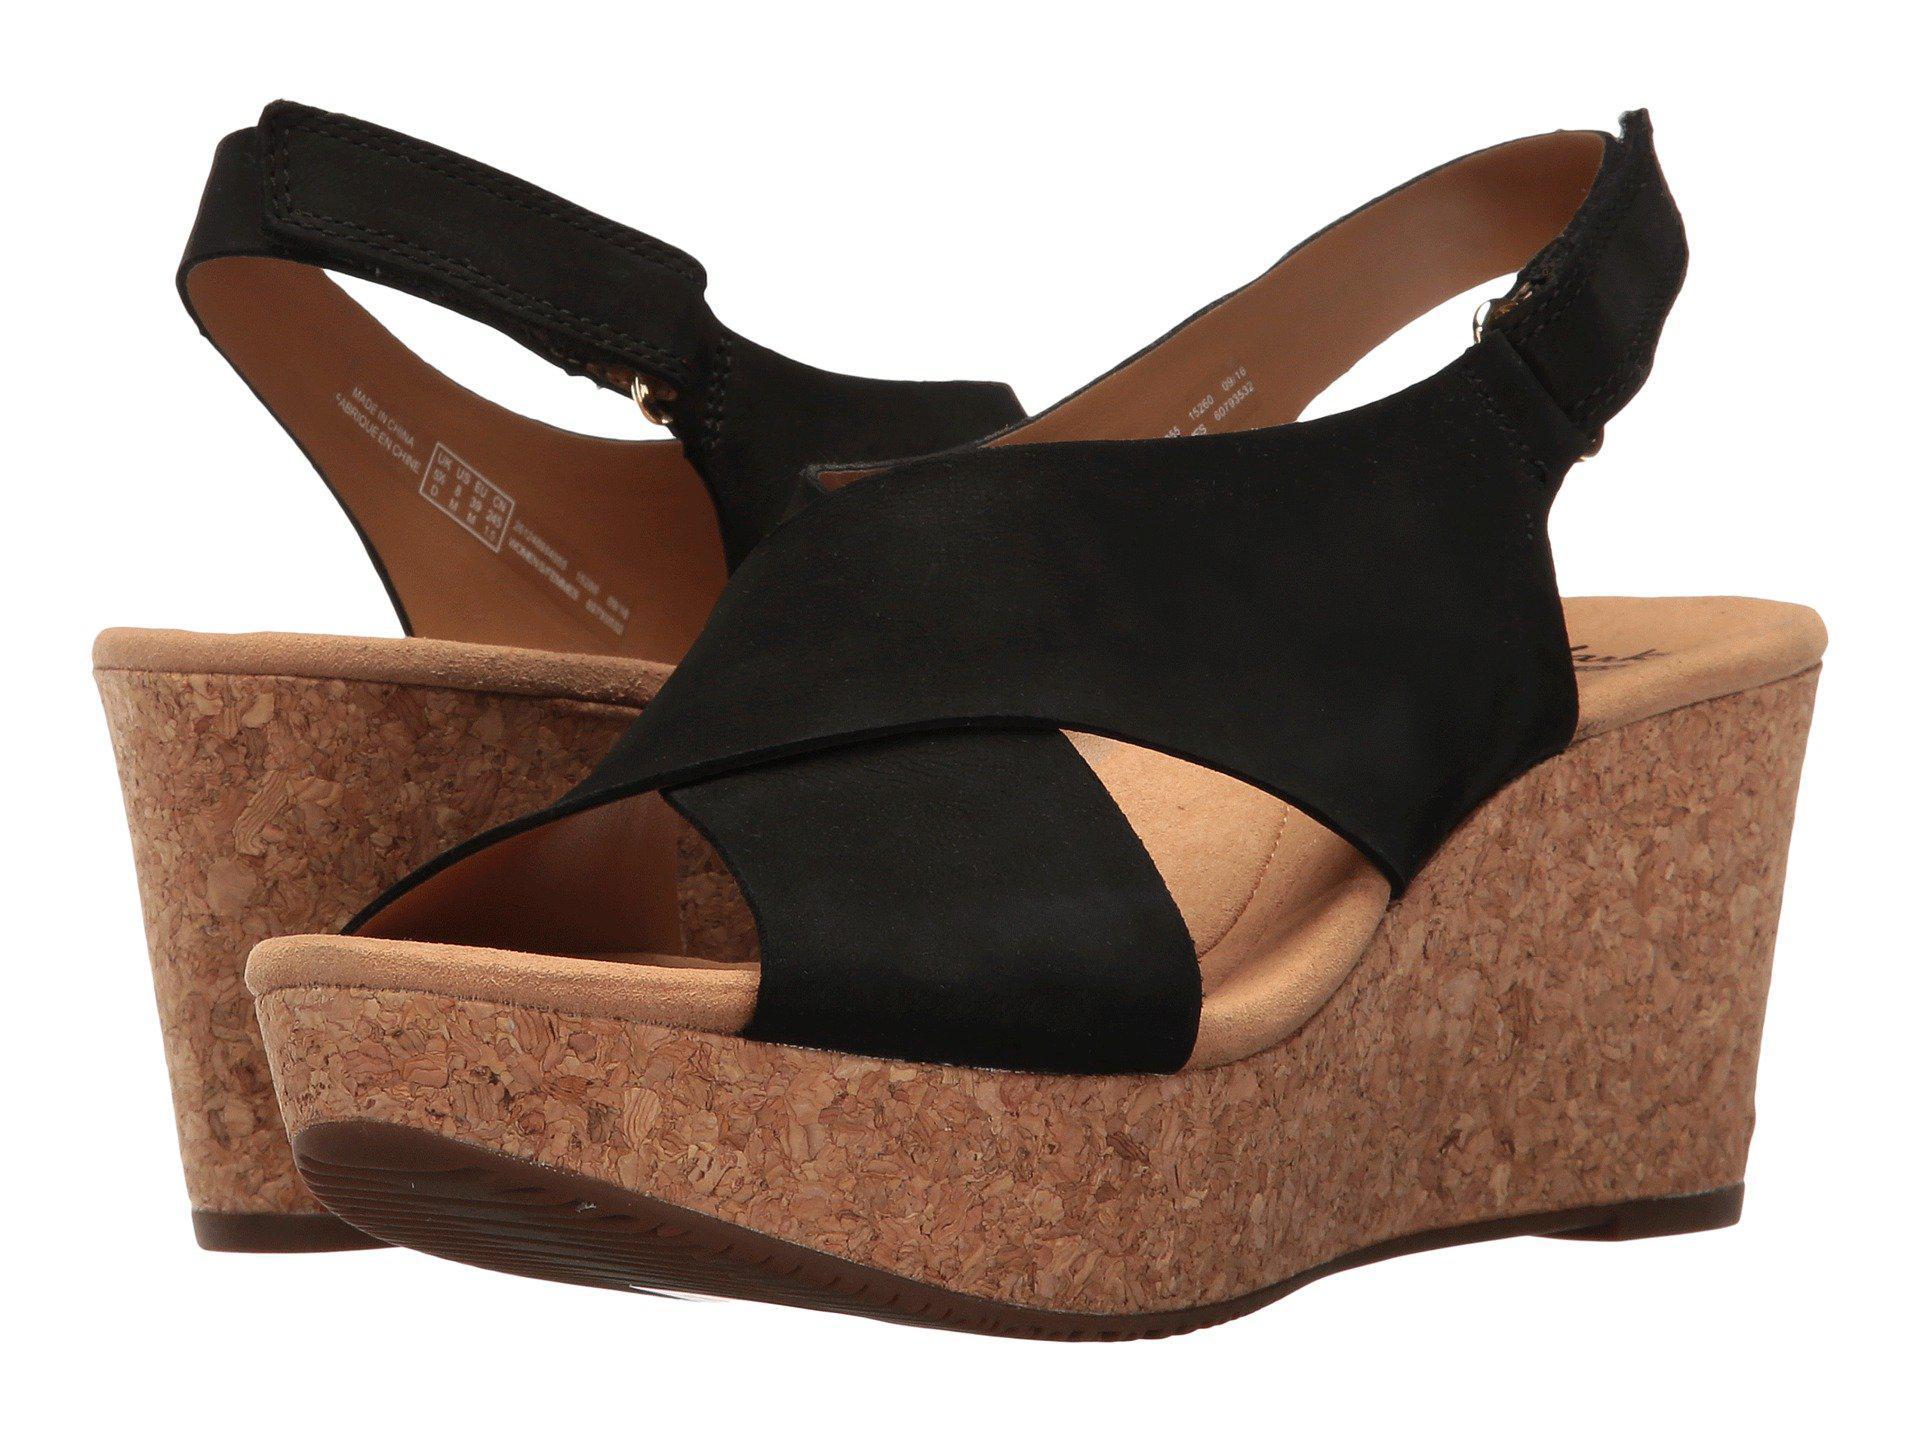 1a8815e4b7e8 Lyst - Clarks Annadel Eirwyn (gold Metallic) Women s Sandals in Black